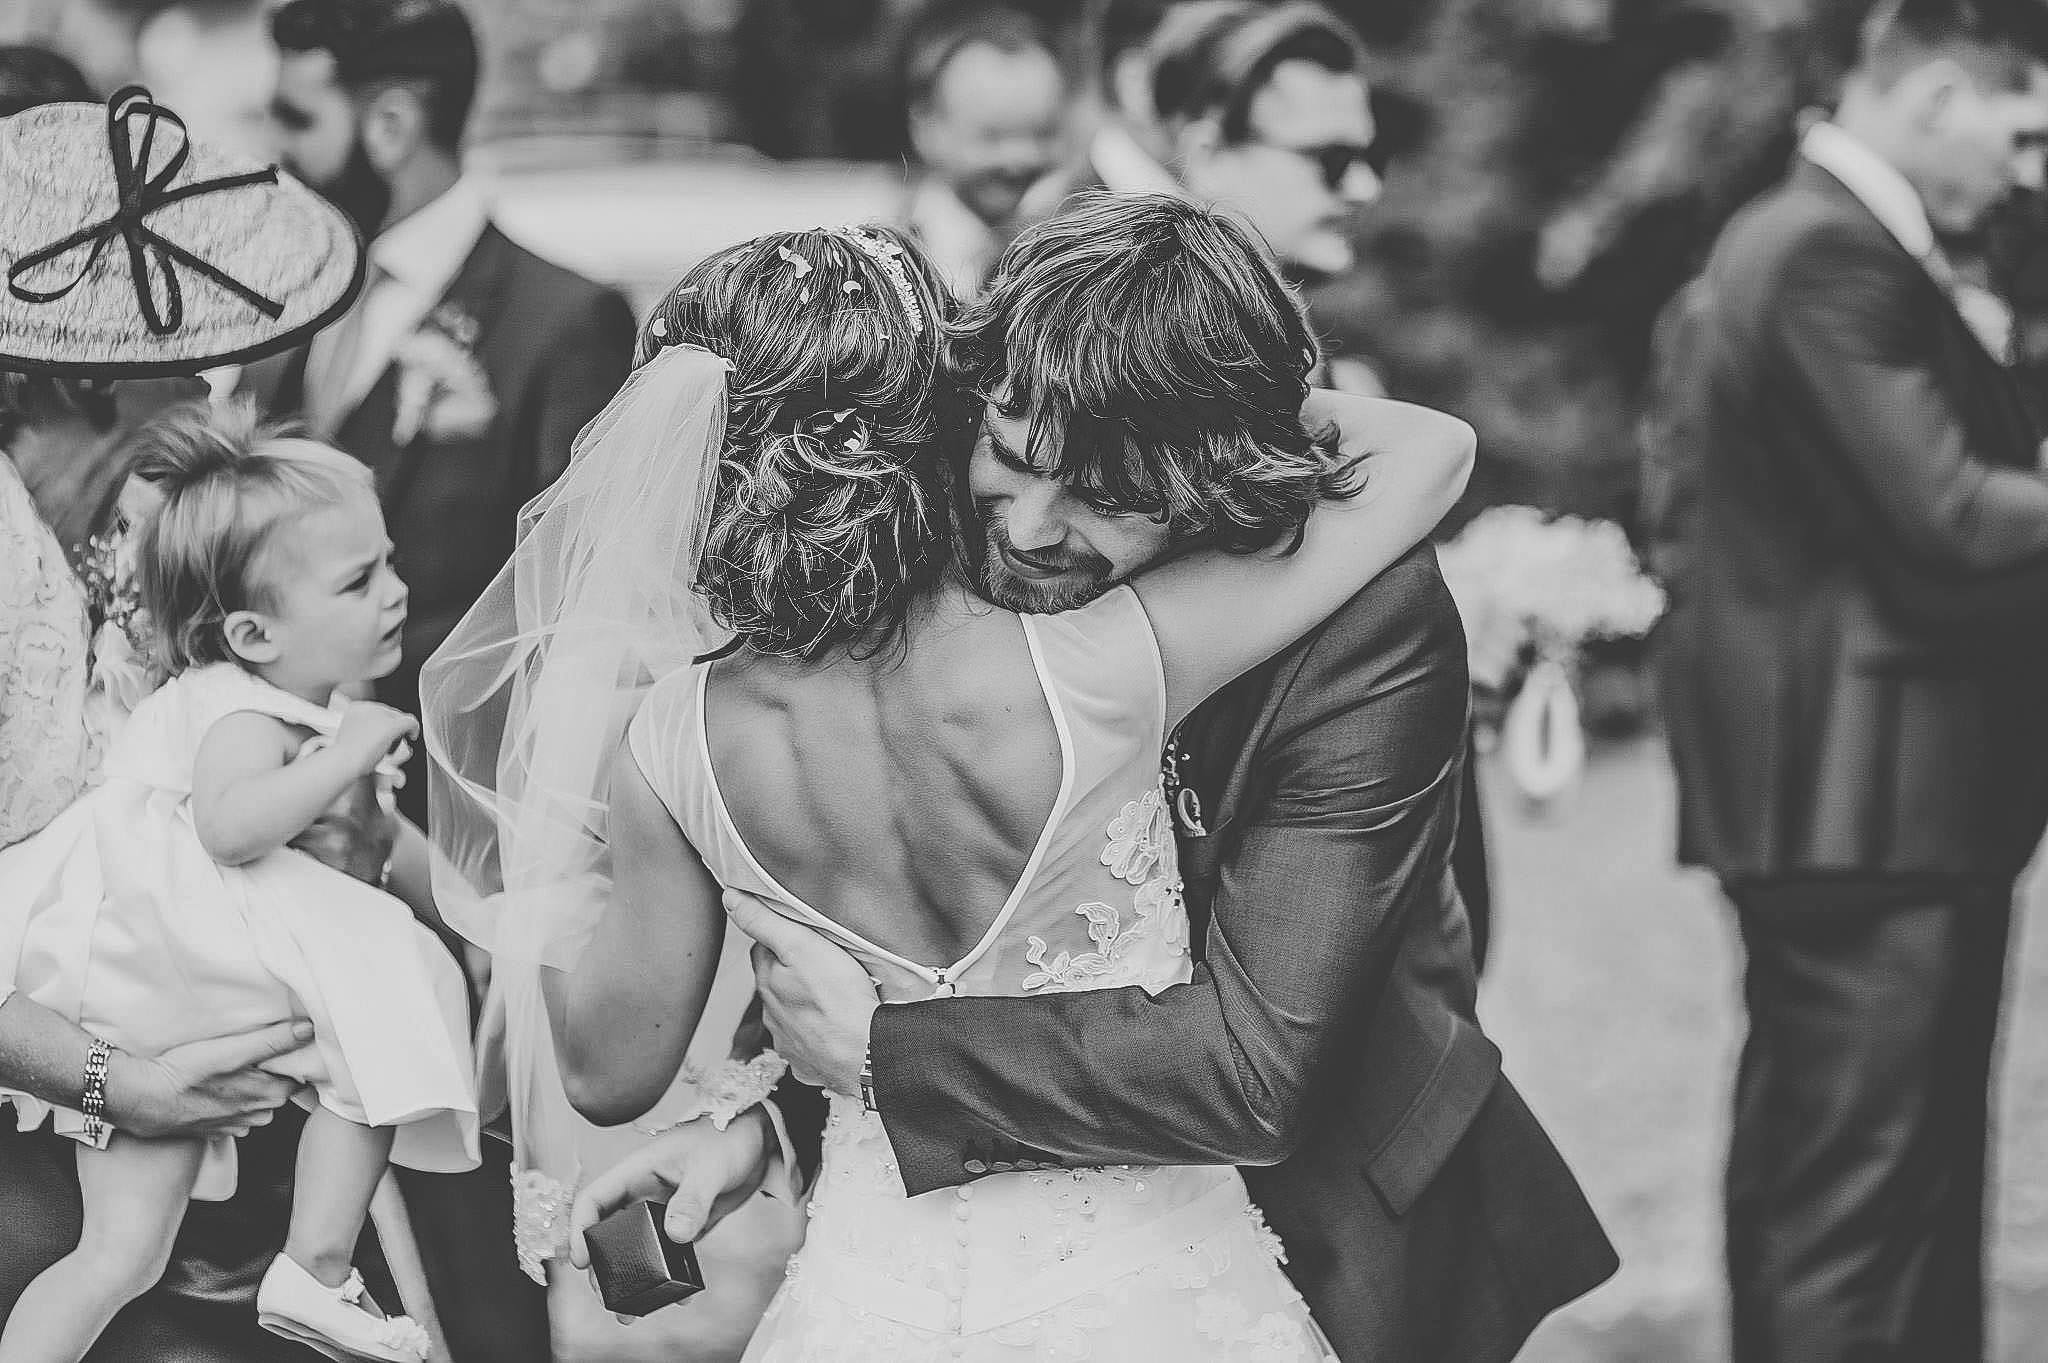 wedding photography midlands 72 - Midlands wedding photography - 2015 Review